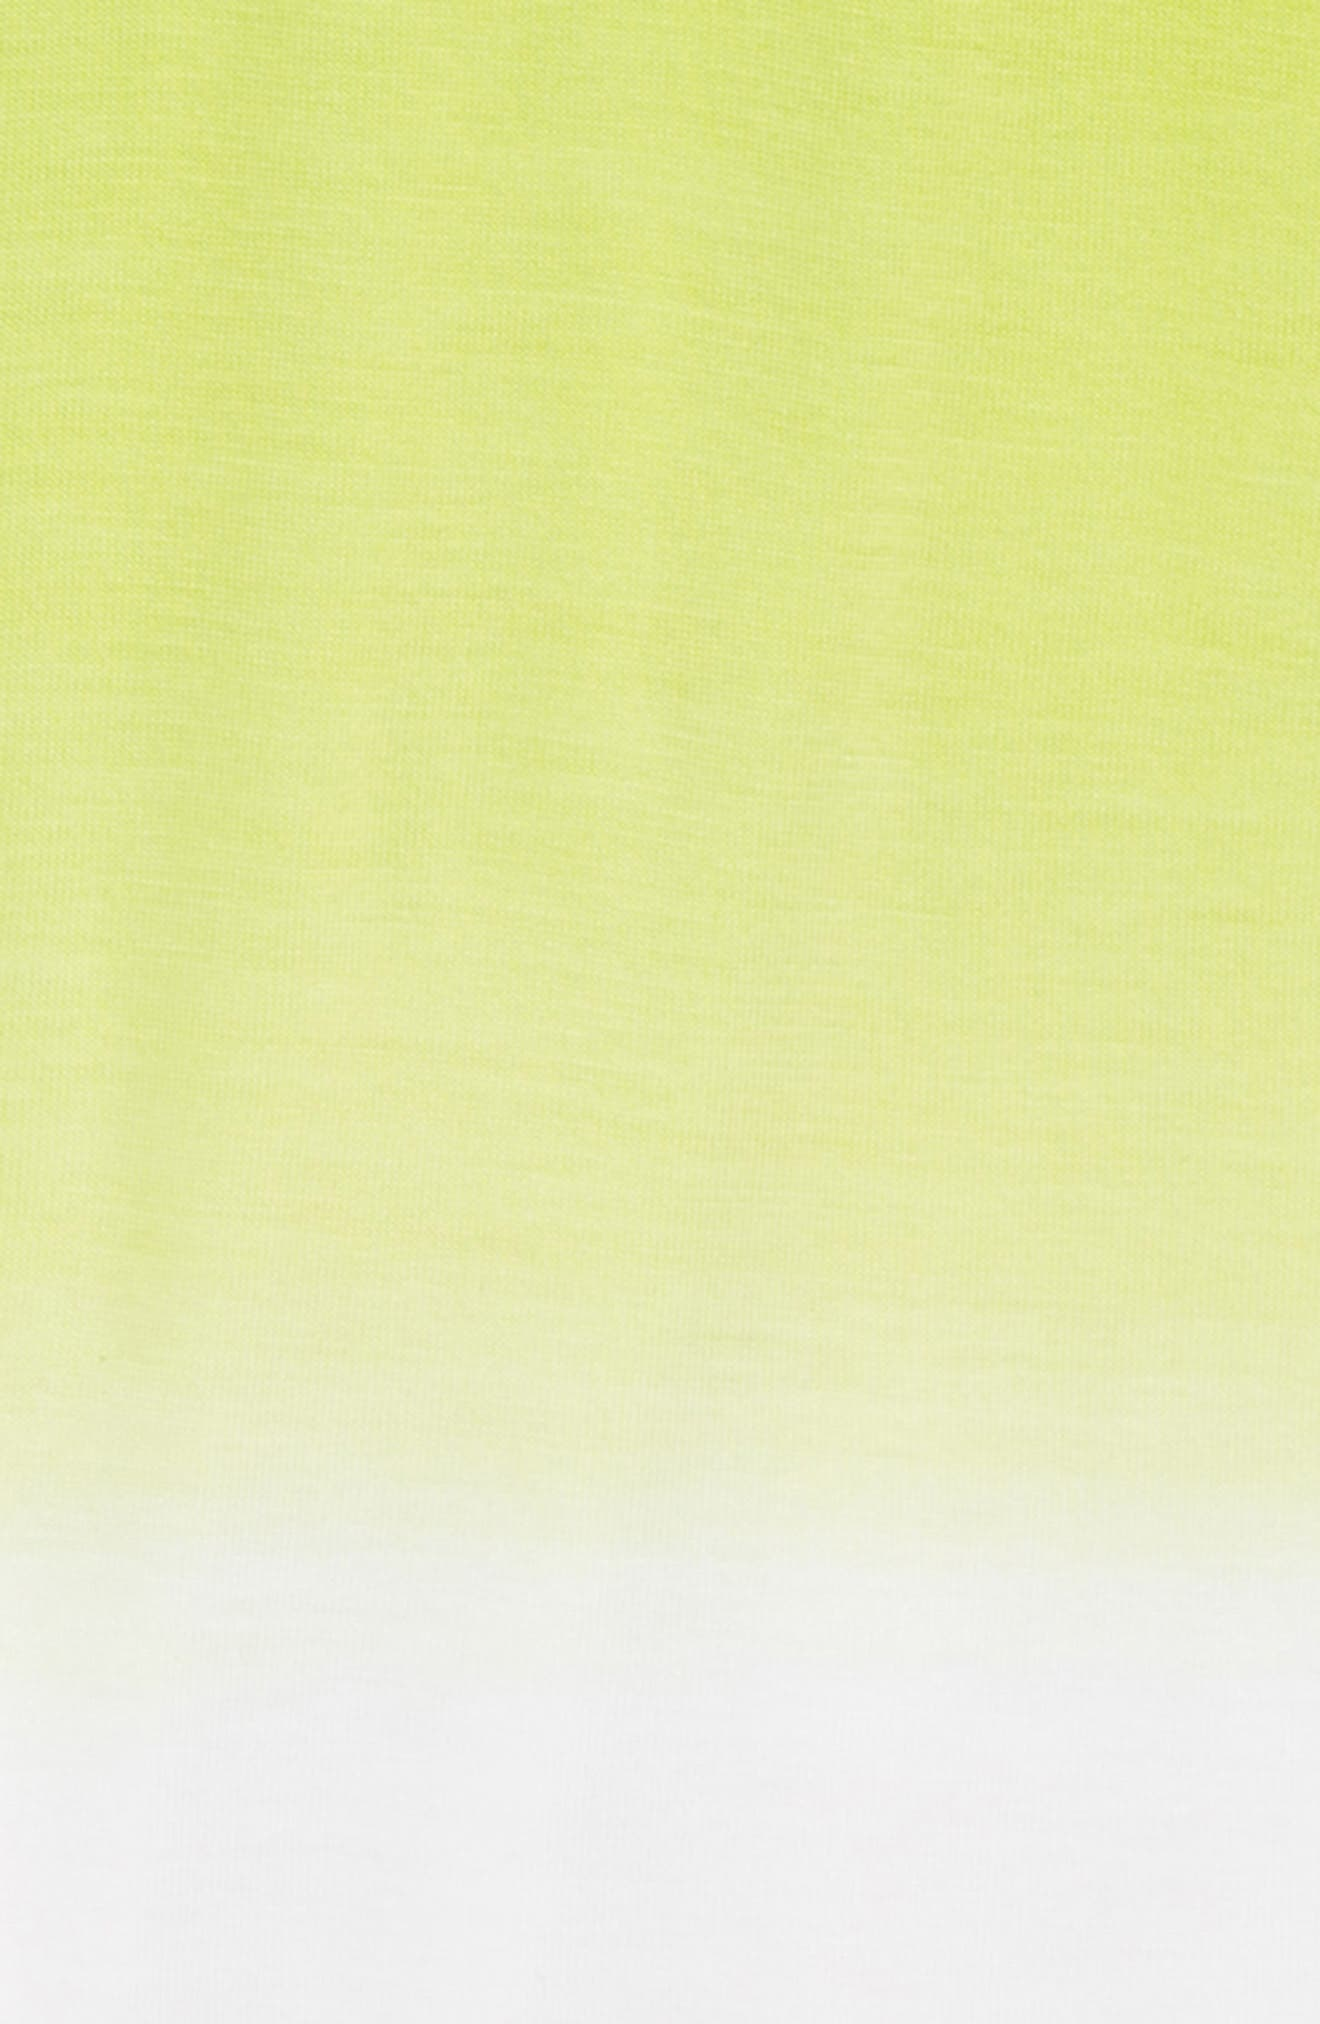 Dip Dye Cold Shoulder Tee,                             Alternate thumbnail 2, color,                             Green Sulphur- White Ombre